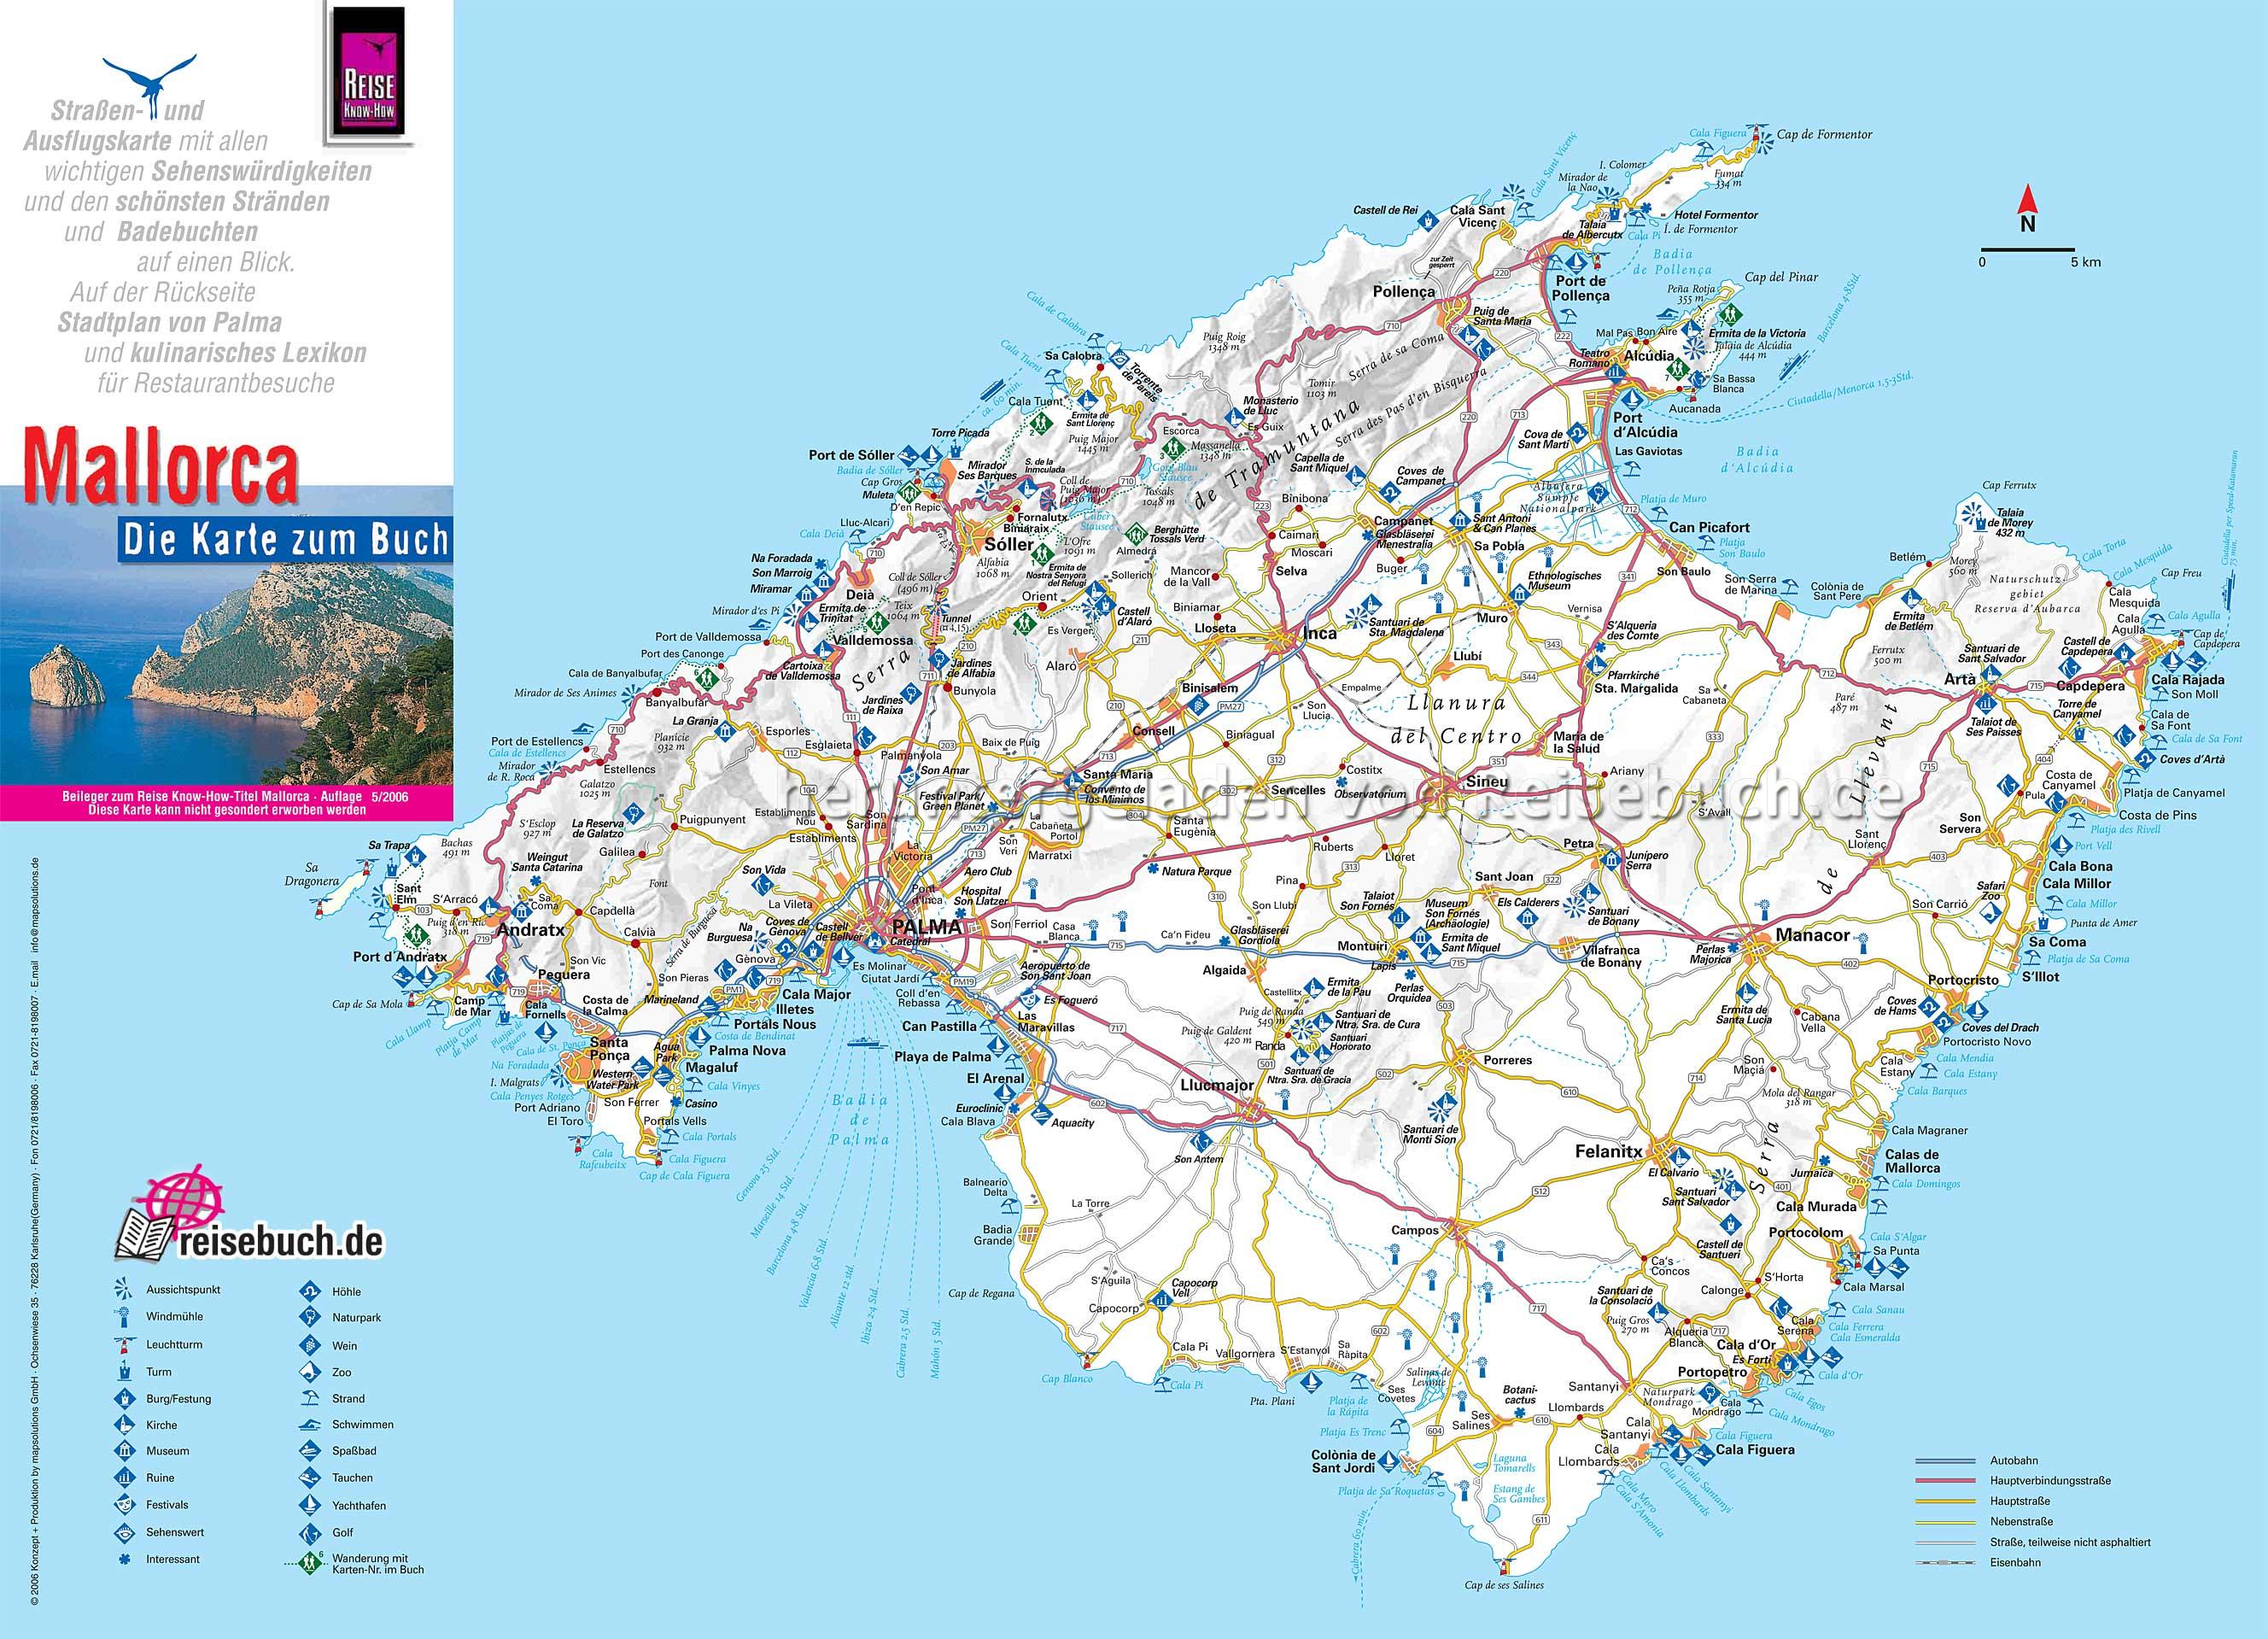 mallorcakarte-web-old.jpg Karte Mallorca